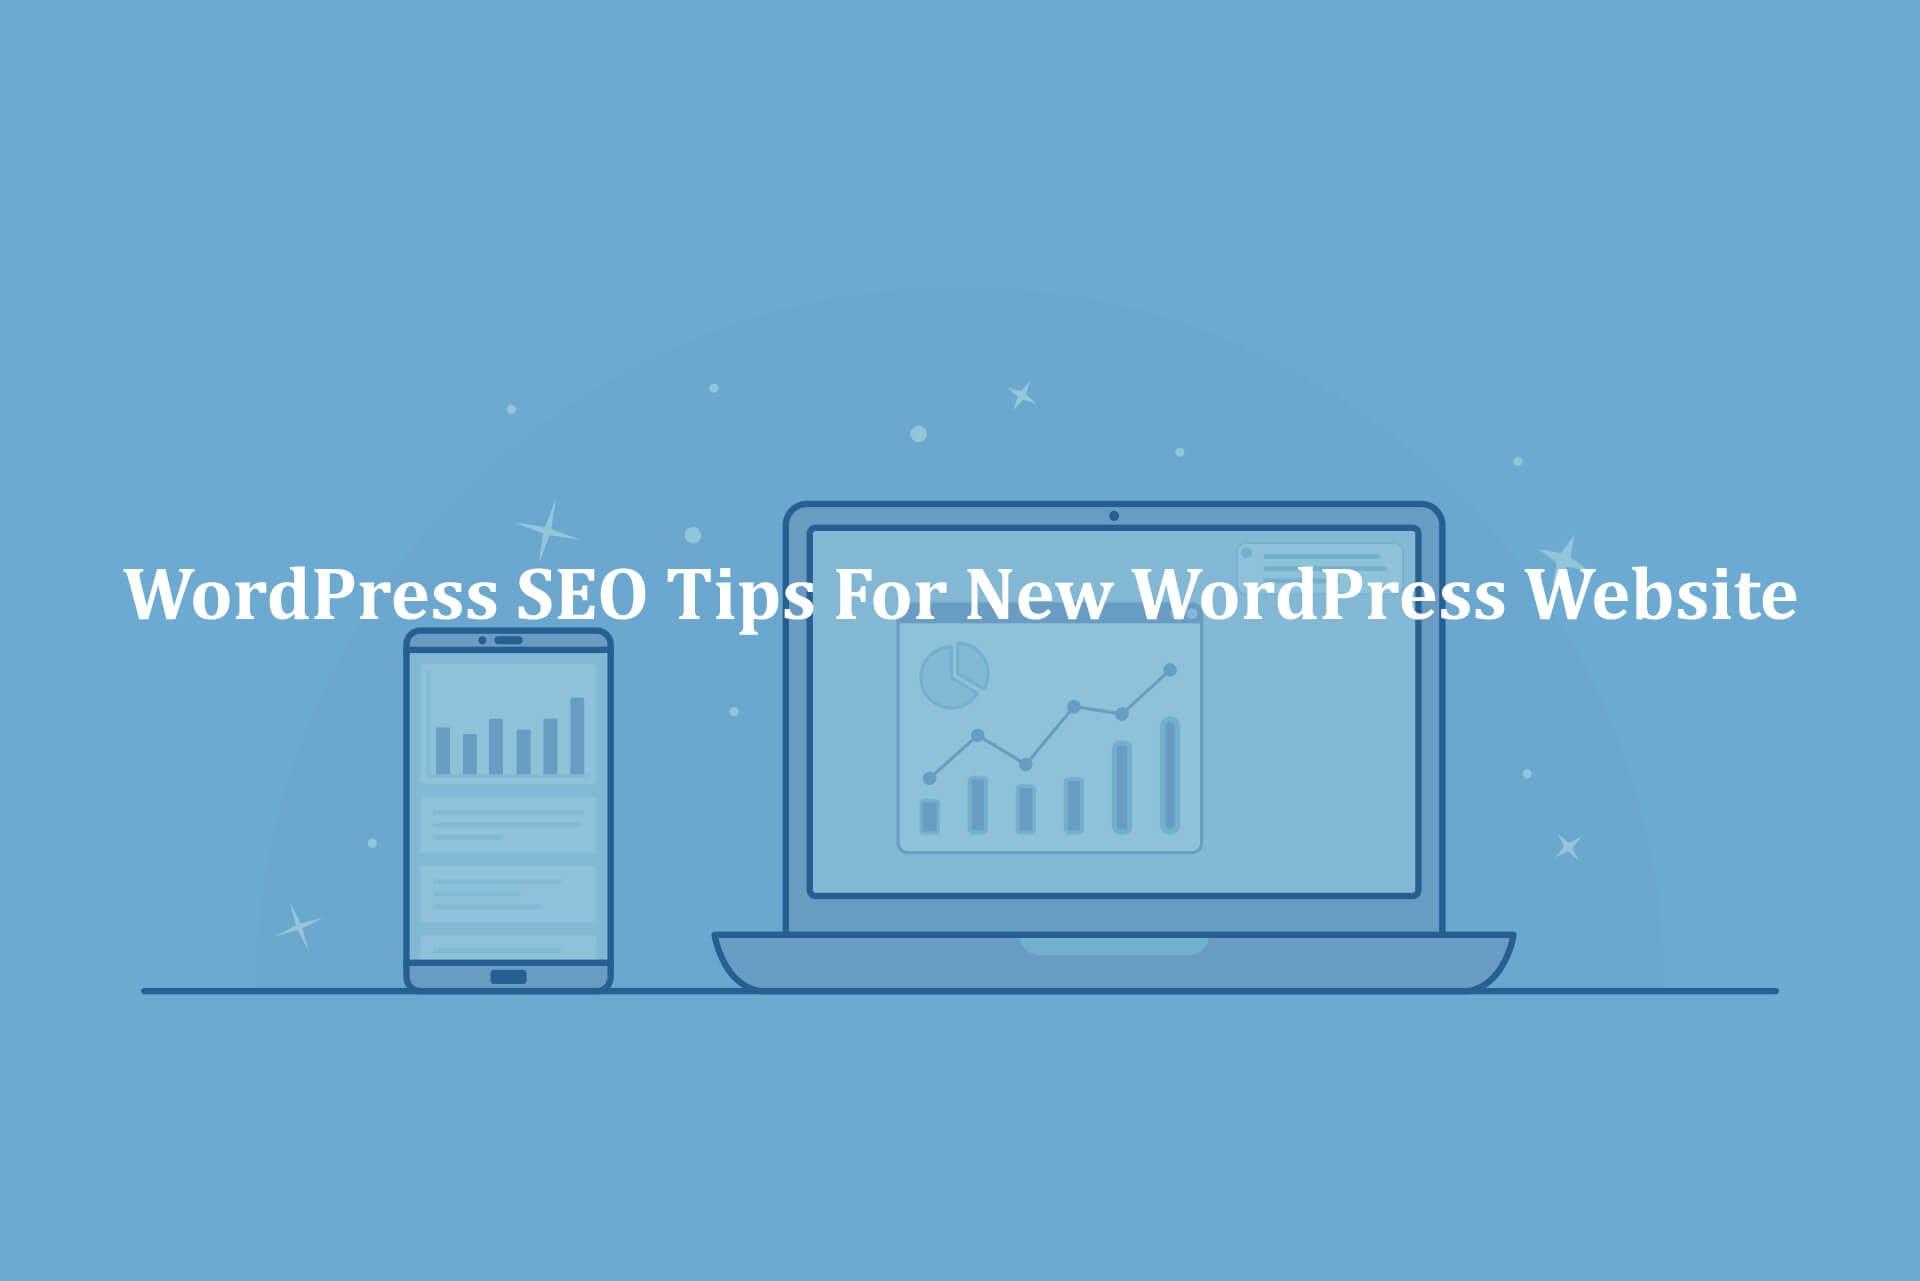 Important-WordPress-SEO-Tips-for-New-WordPress-Website